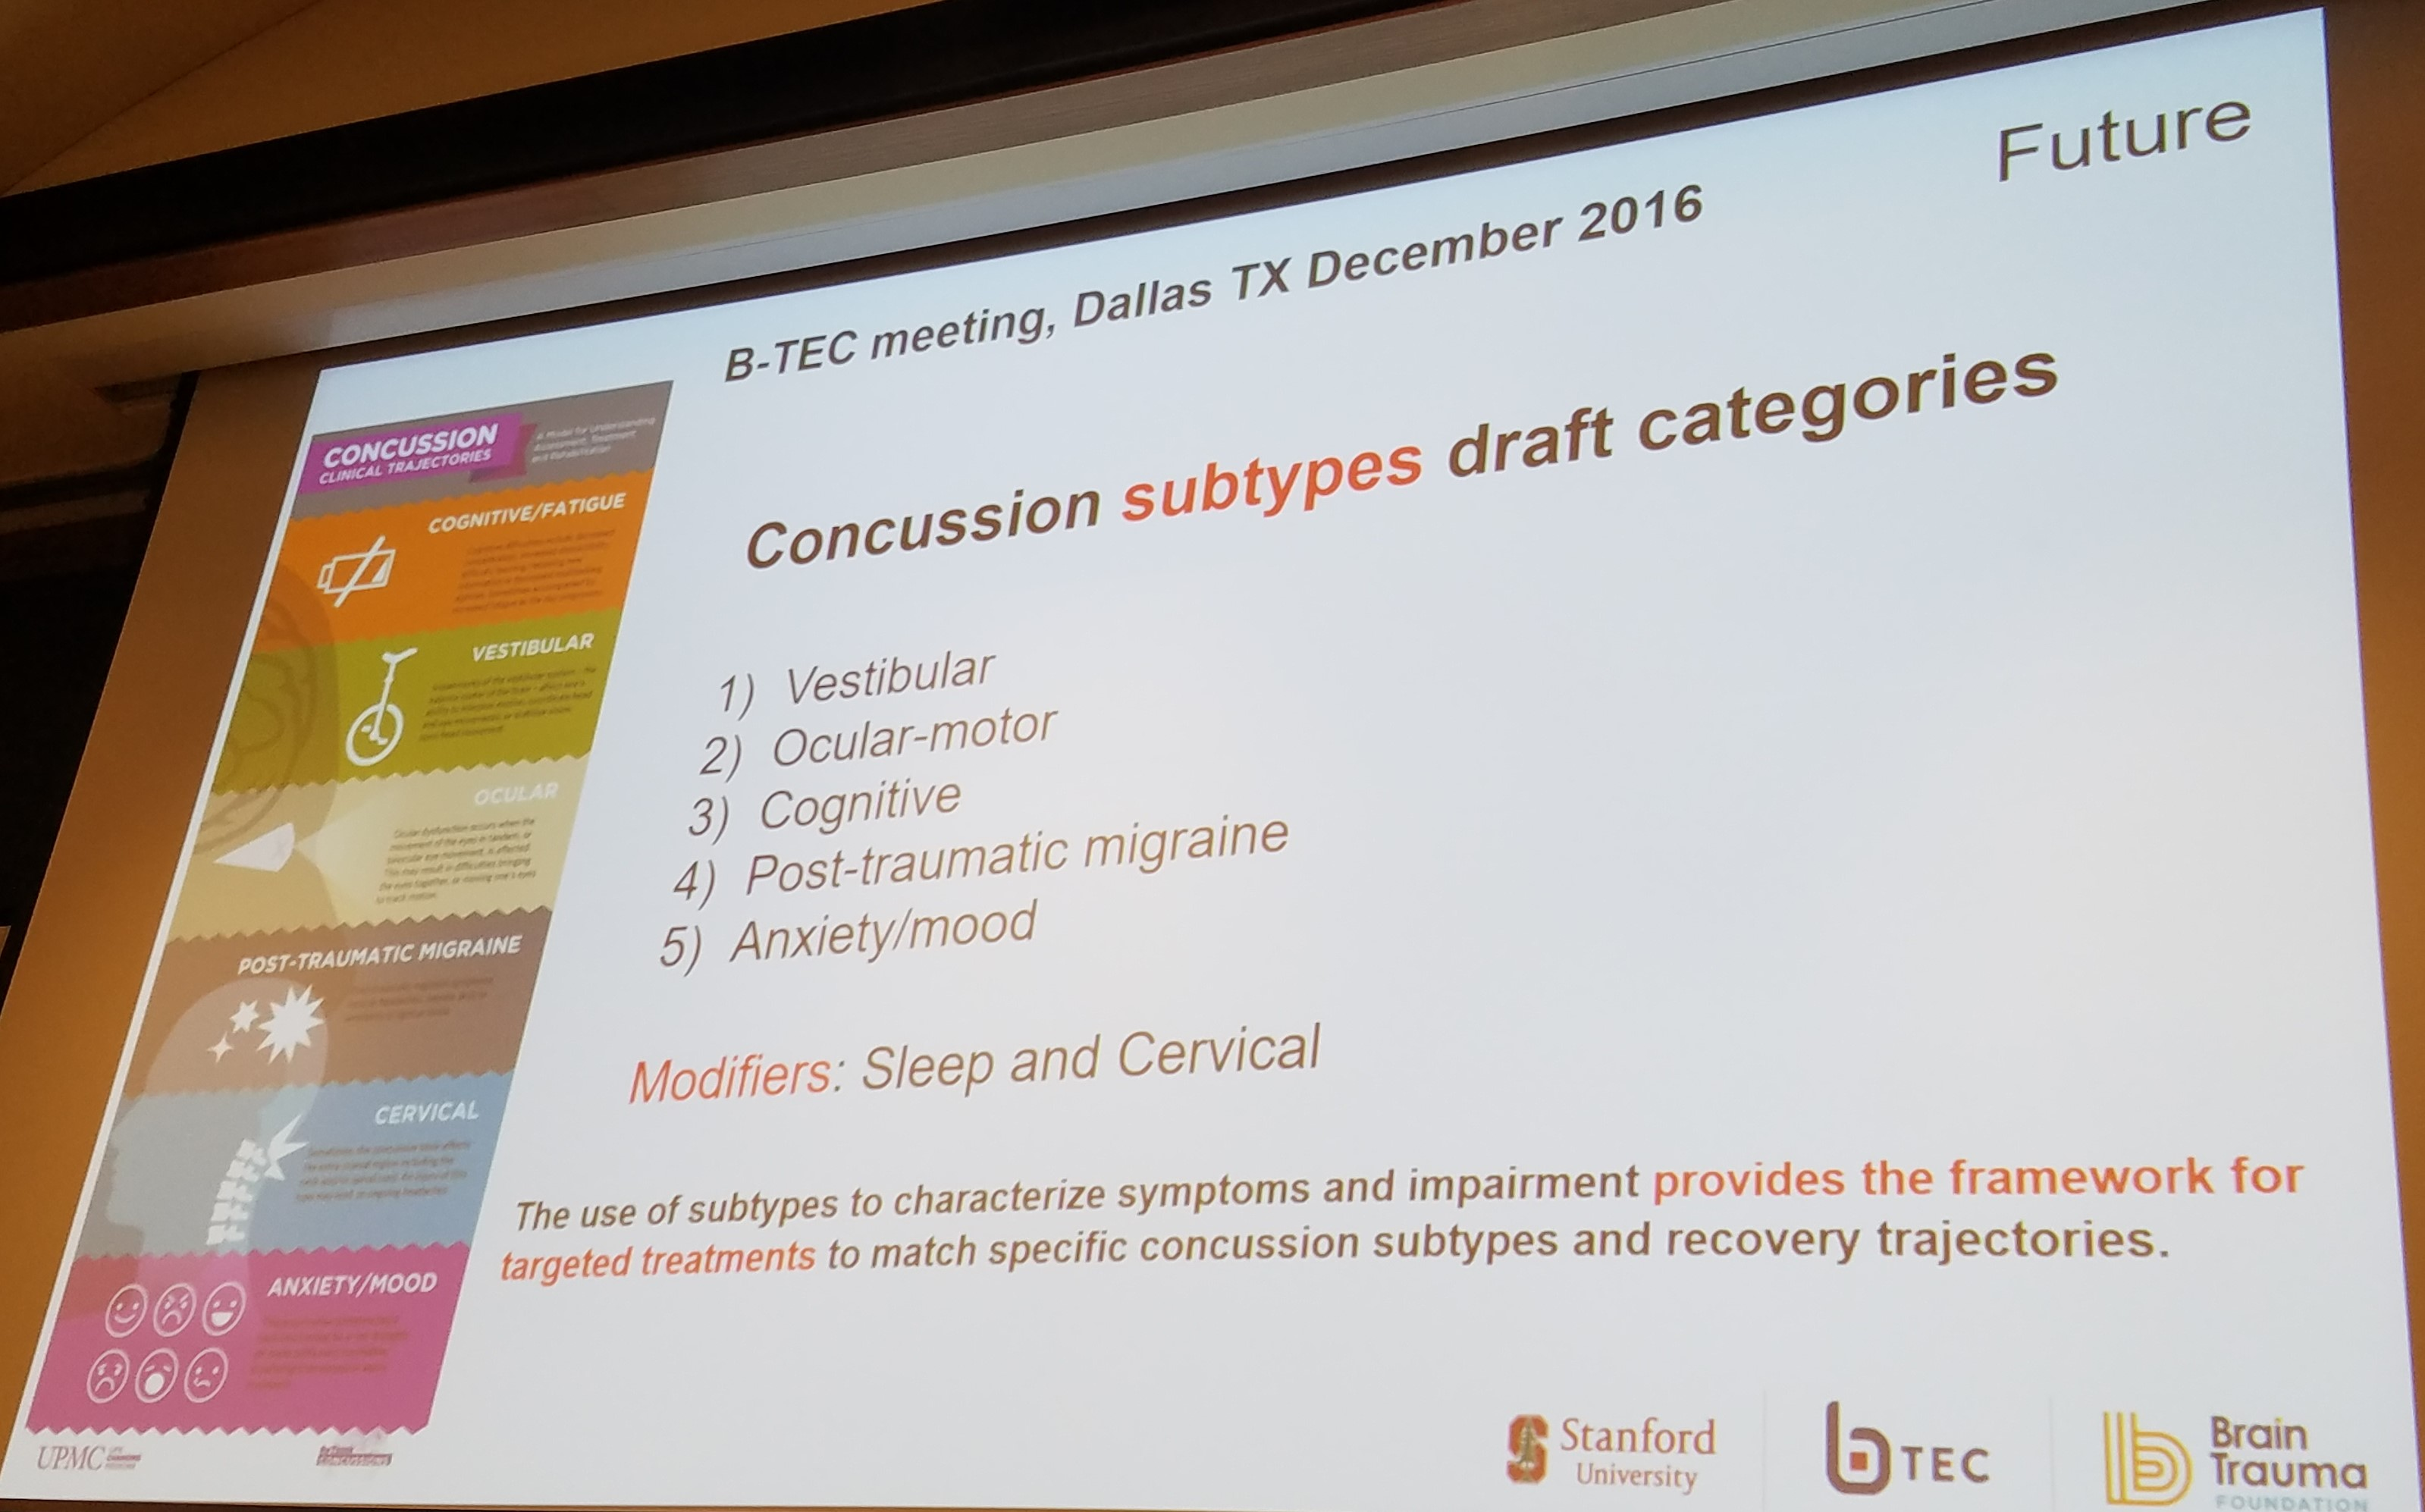 types of concussion, grades of concussion, severity of concussion, symptoms of concussion